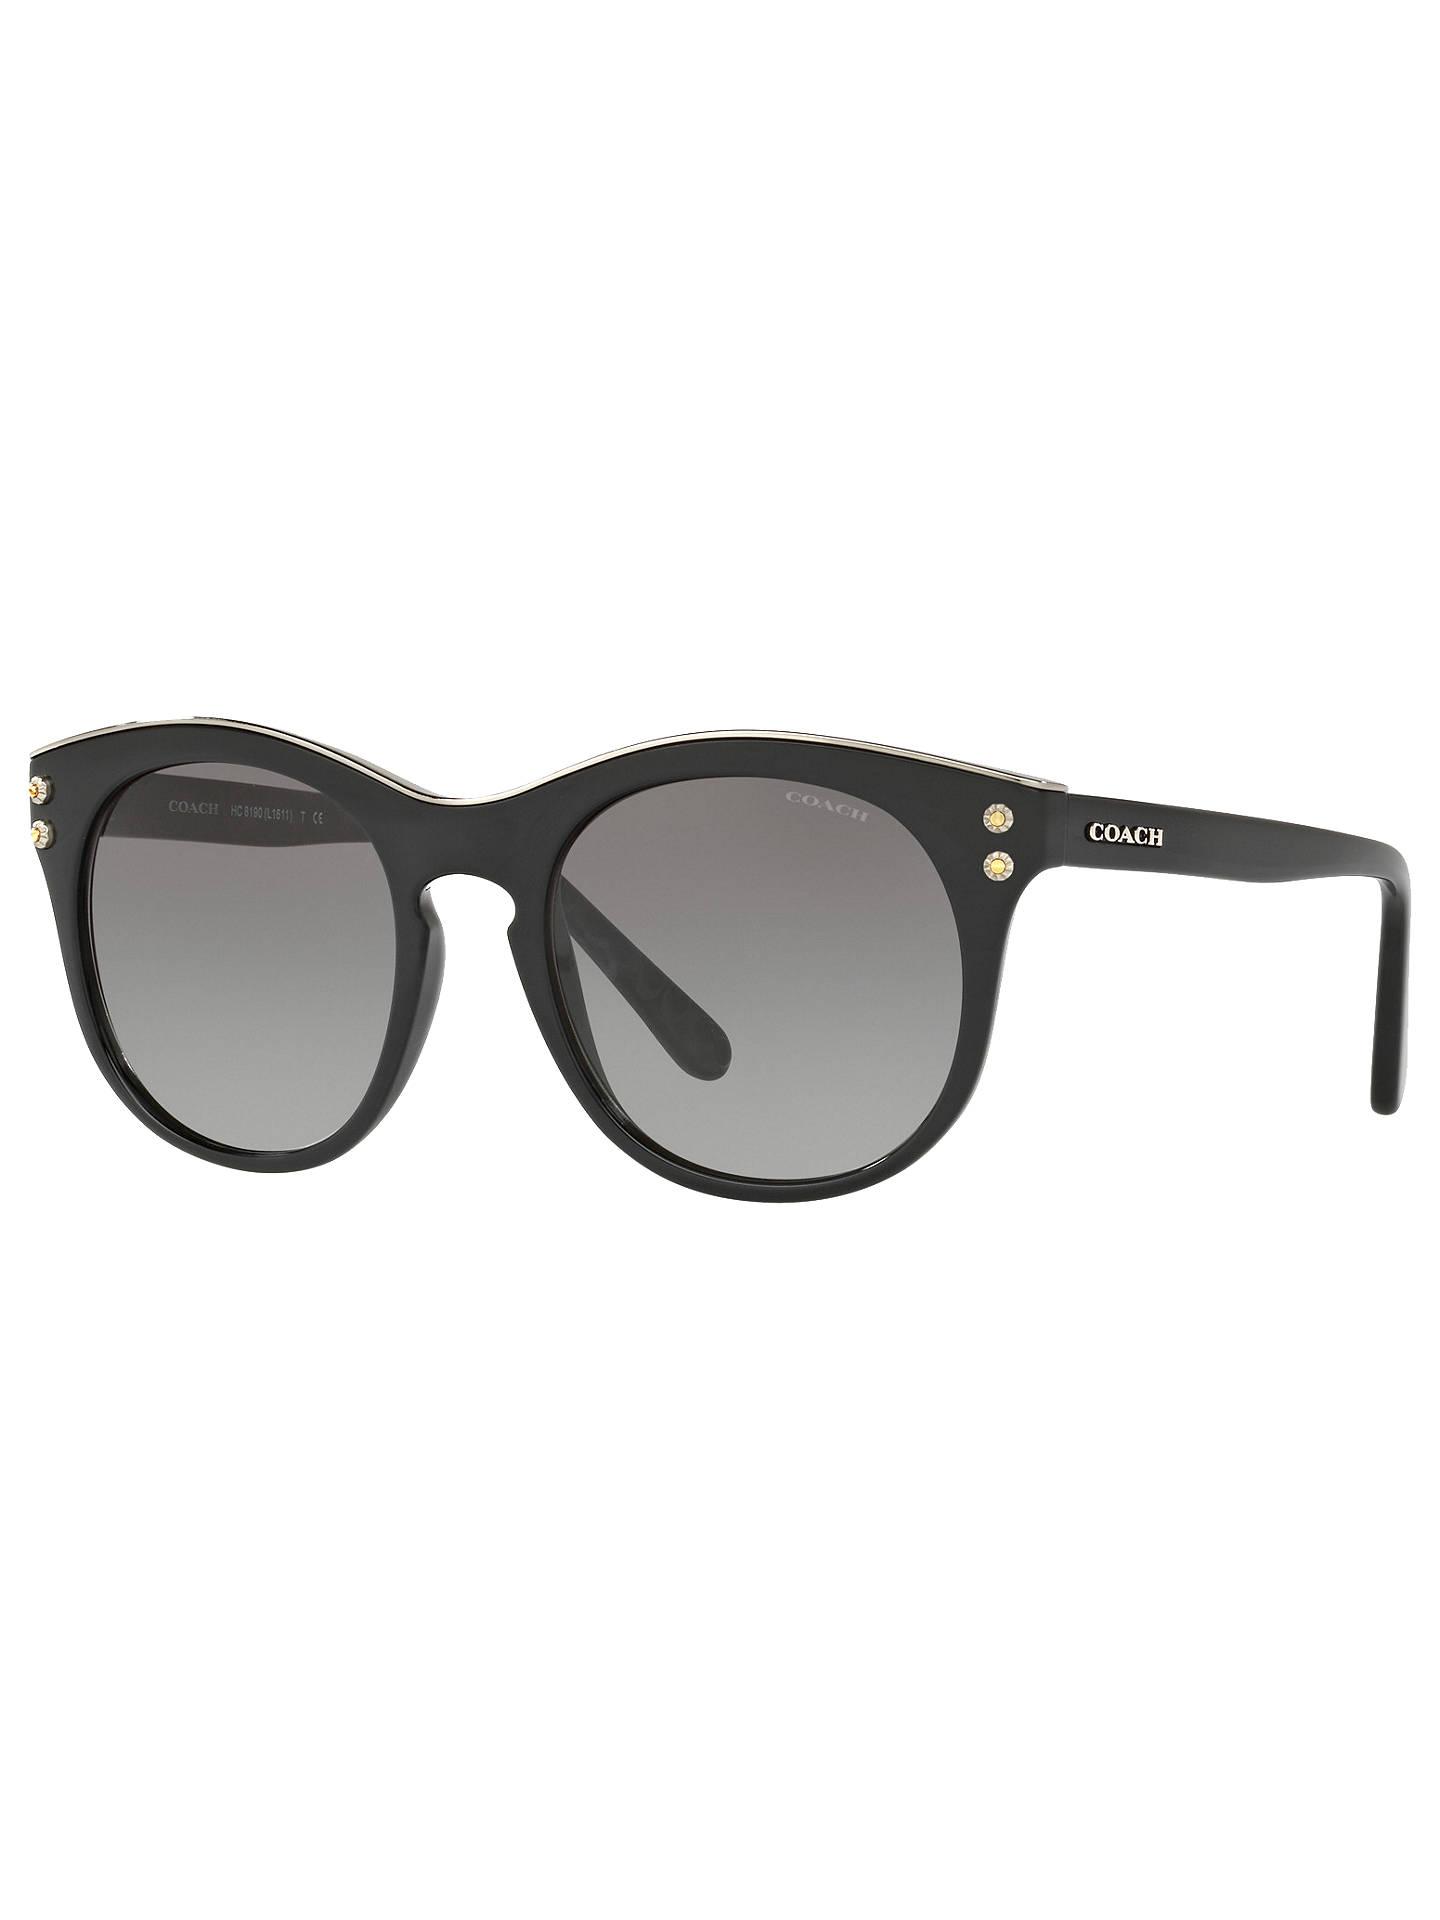 9730a0f26b20 1234 835d6 b0c6d discount buycoach hc8190 oval sunglasses black grey  gradient online at johnlewis 0e1cc 60a8b ireland coach ...